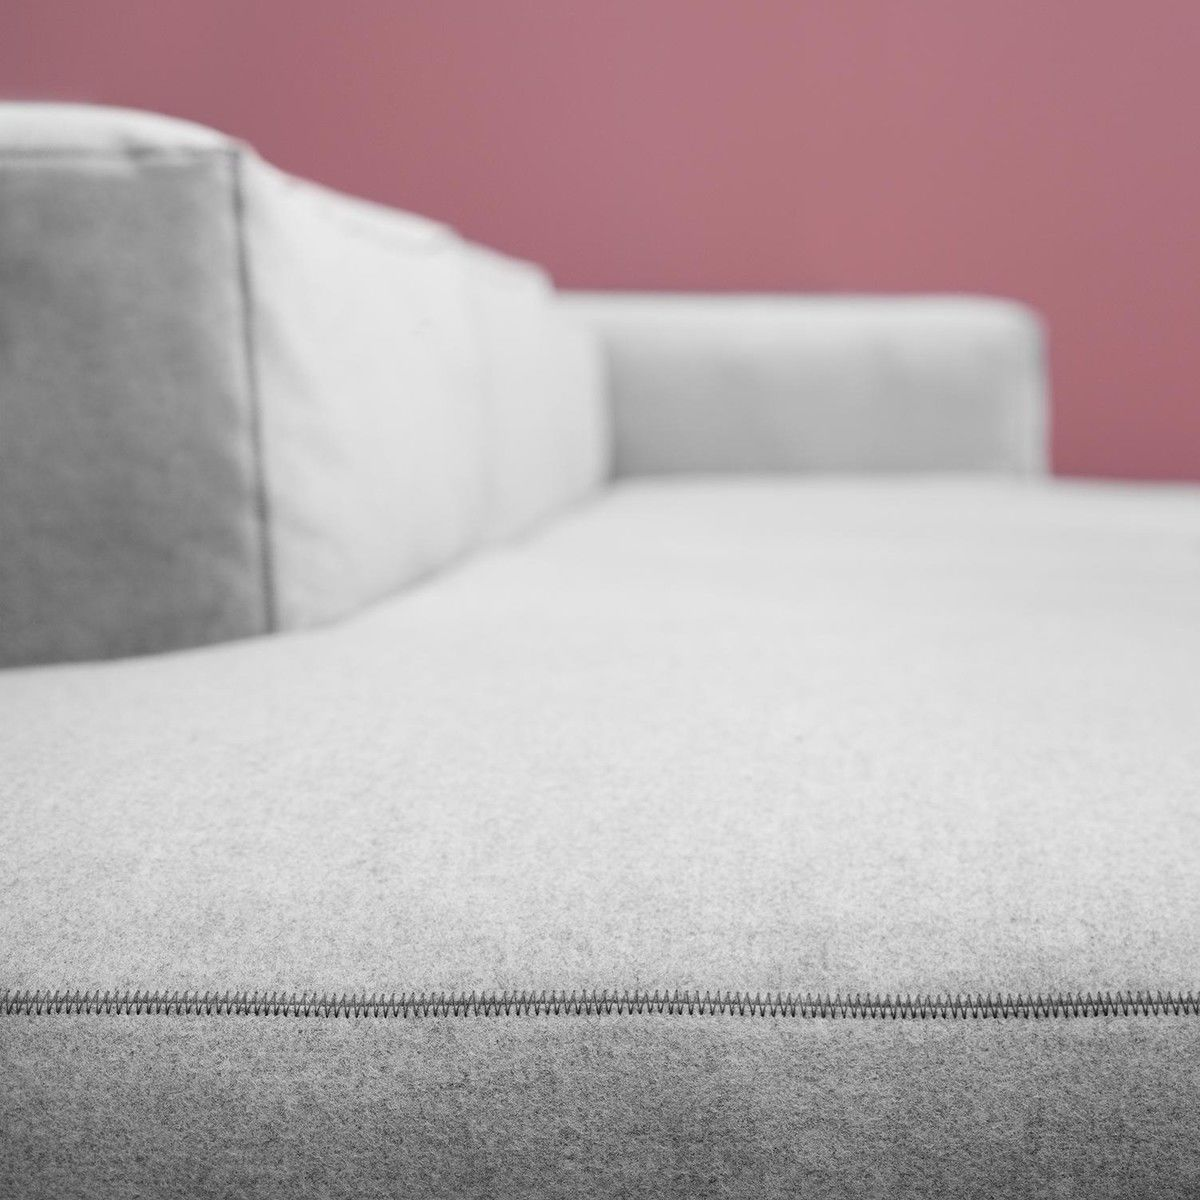 hay mags soft sofa bank e colchoes em porangaba ambientedirect